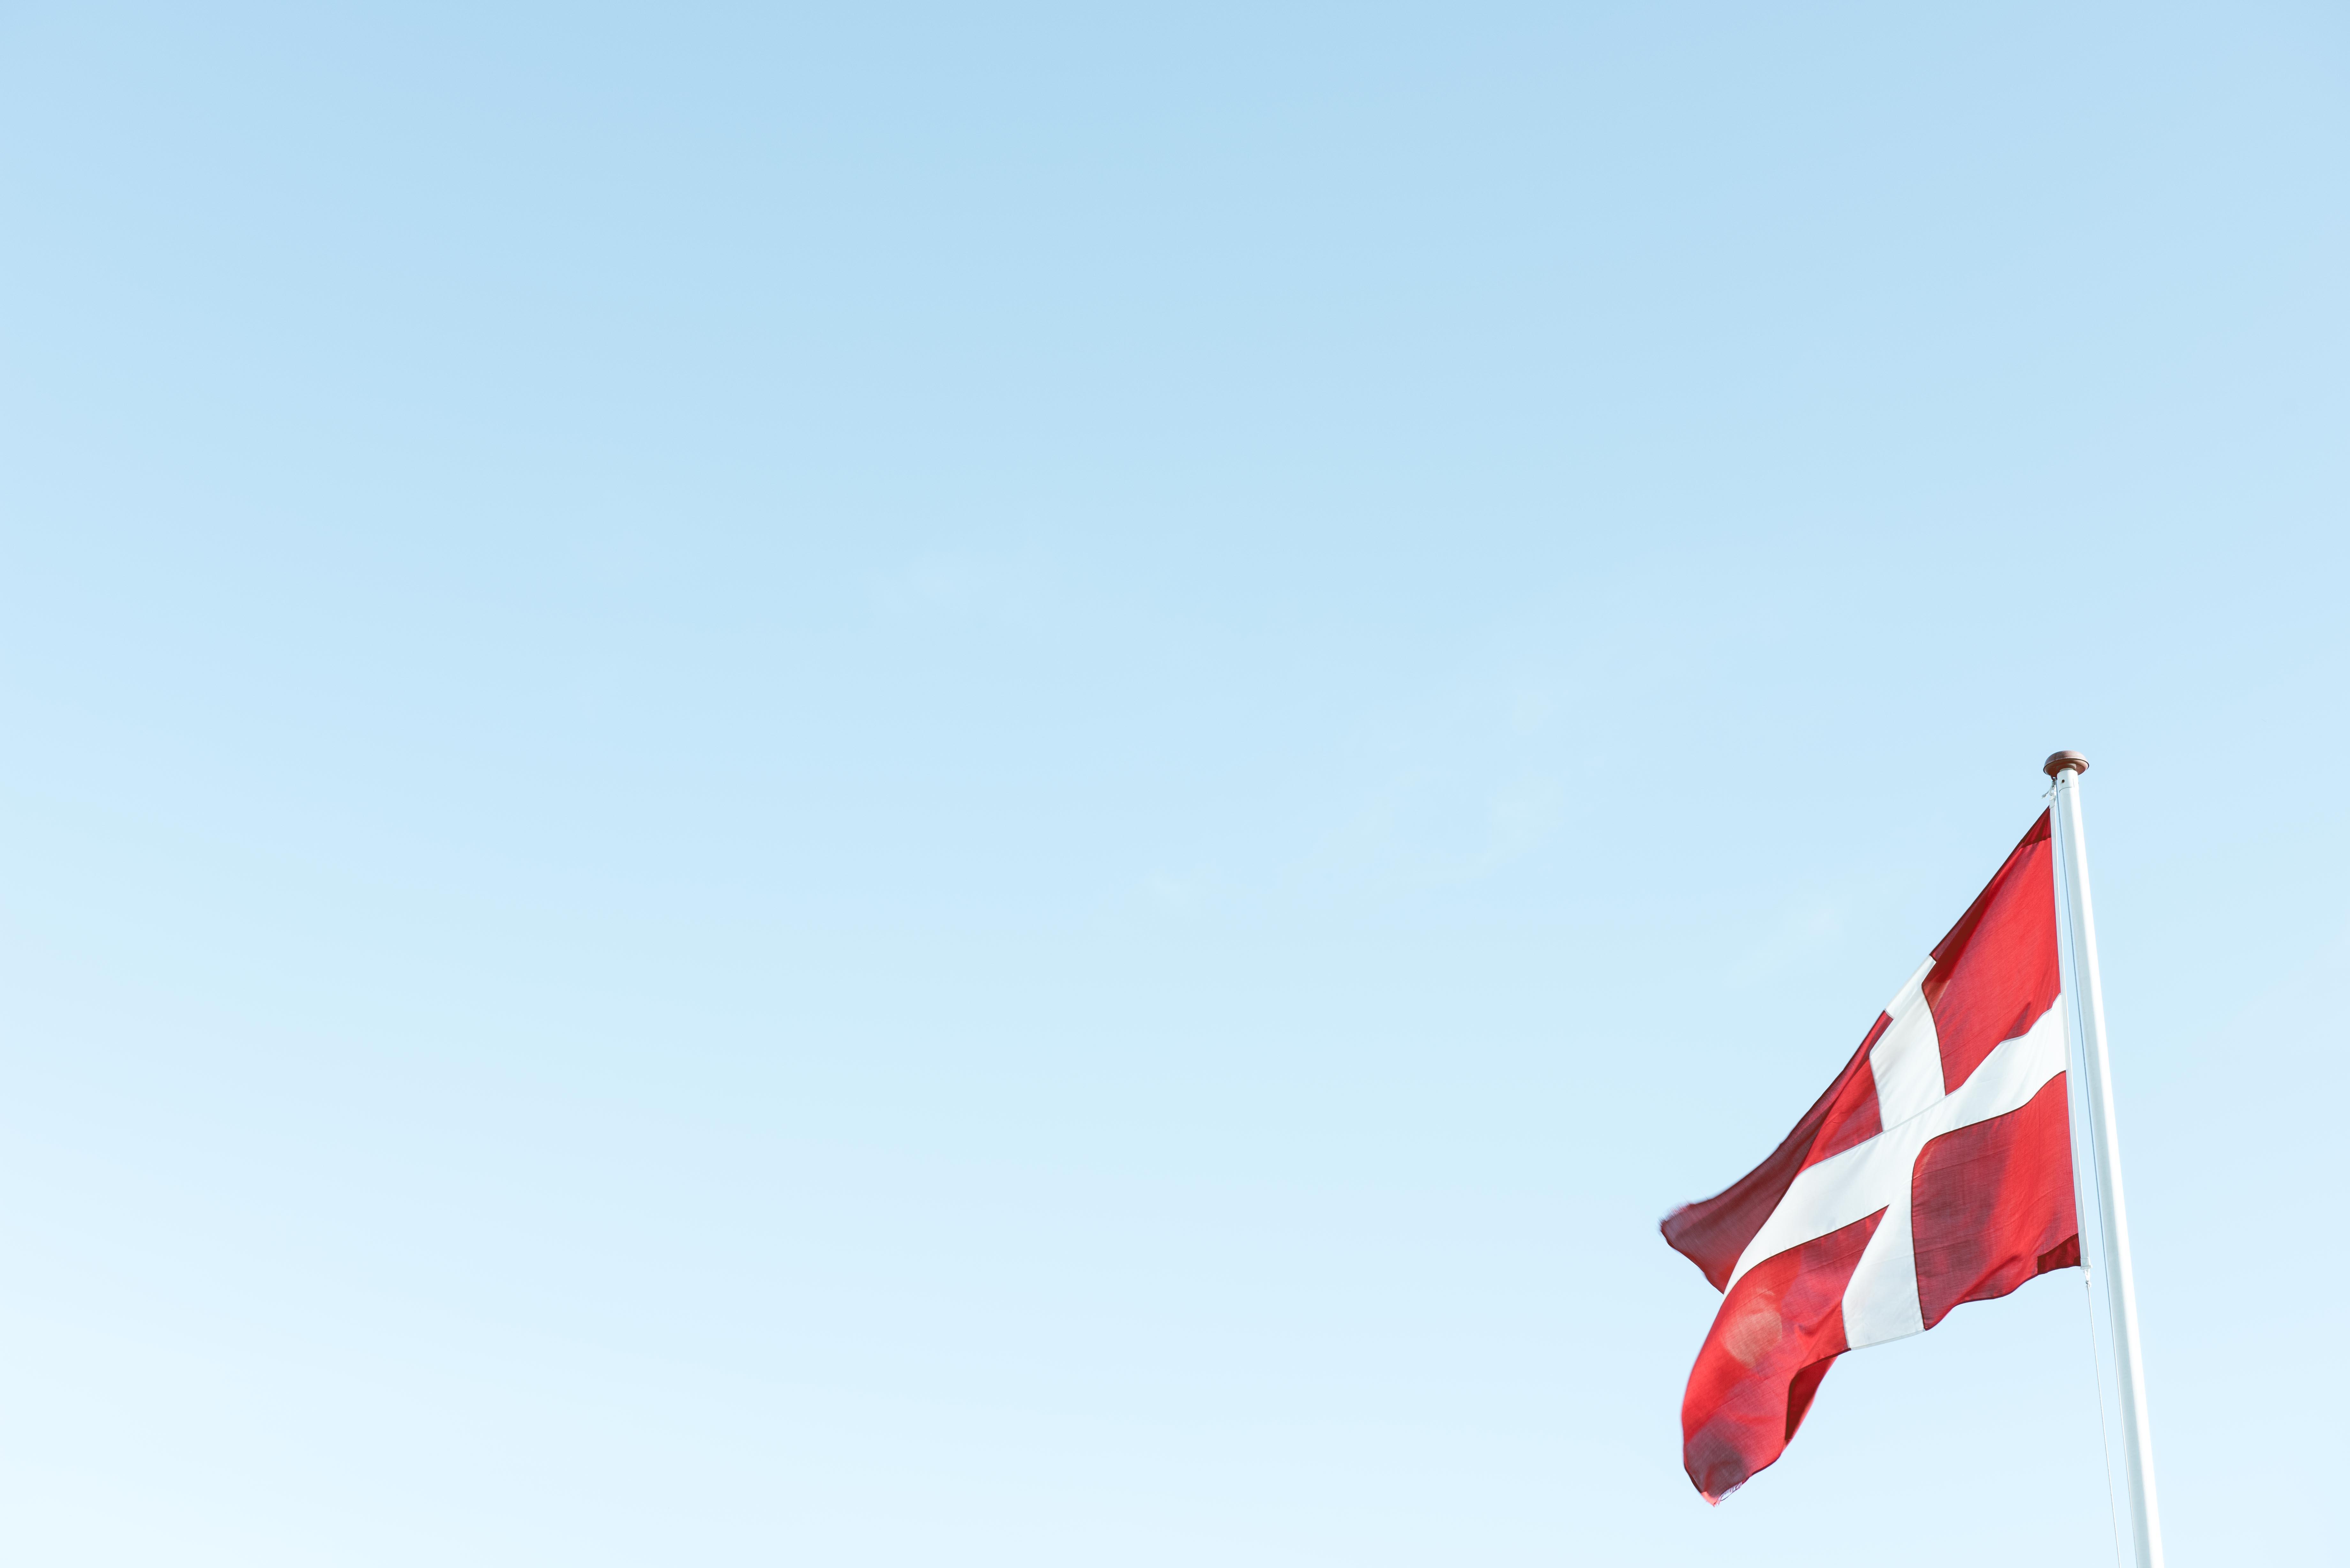 rømø_flagge_dänemark